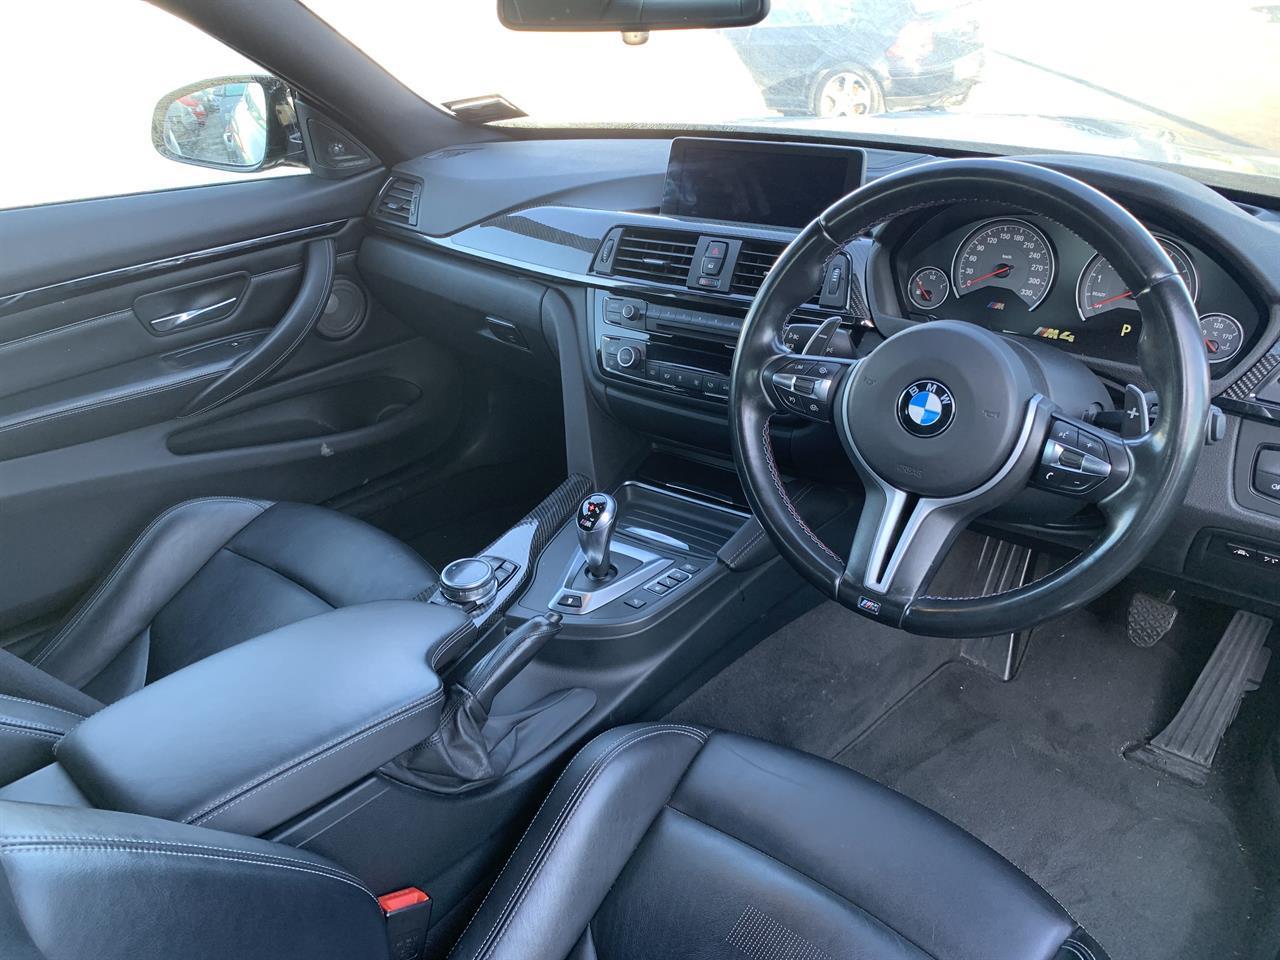 image-6, 2014 BMW M4 at Christchurch